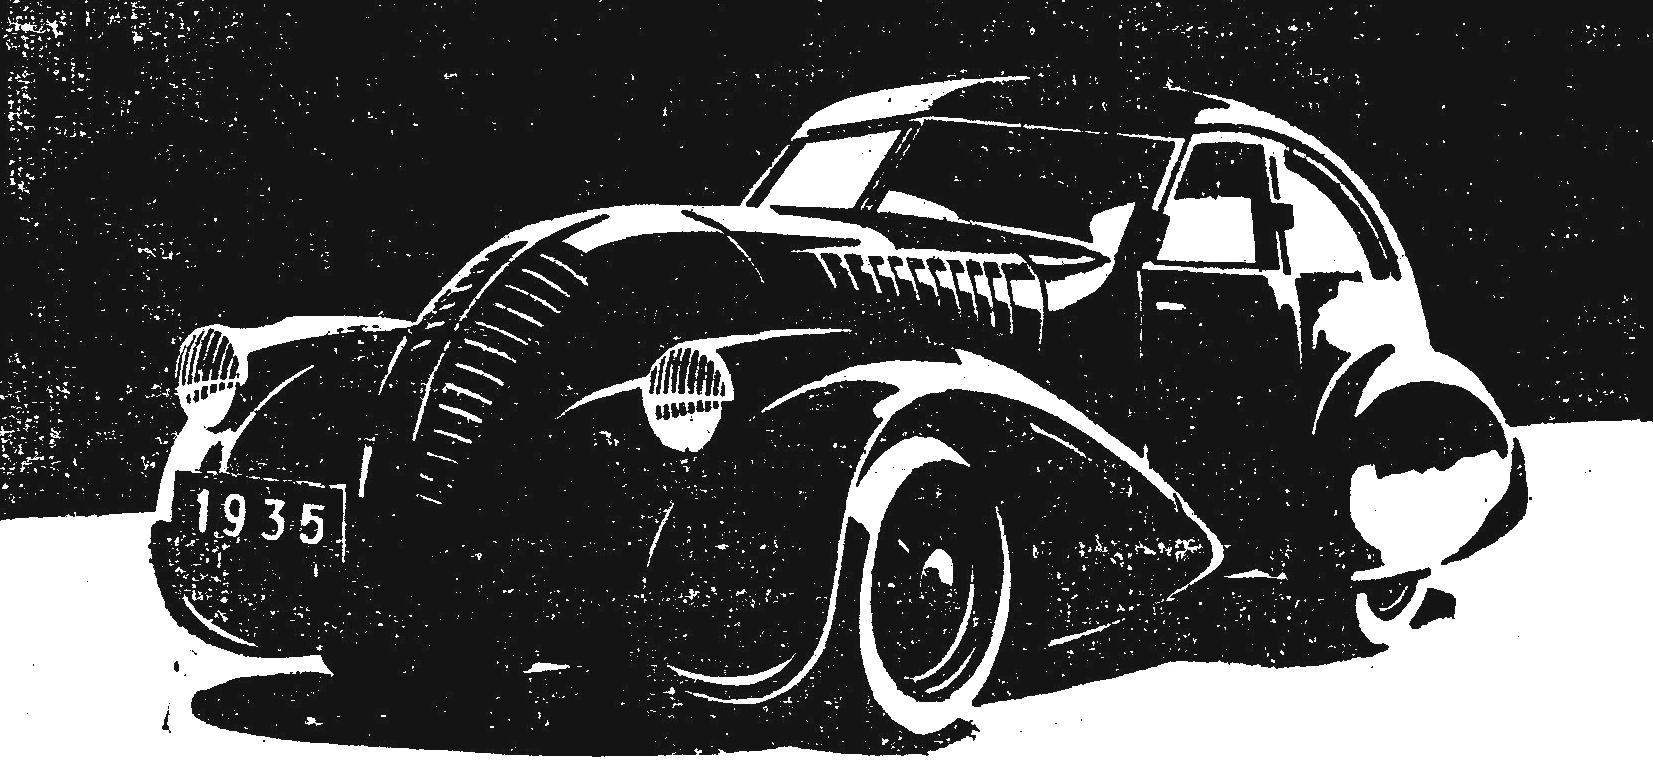 Рис. 4. Обтекаемая машина А. Никитина на шасси ГАЗ-А.